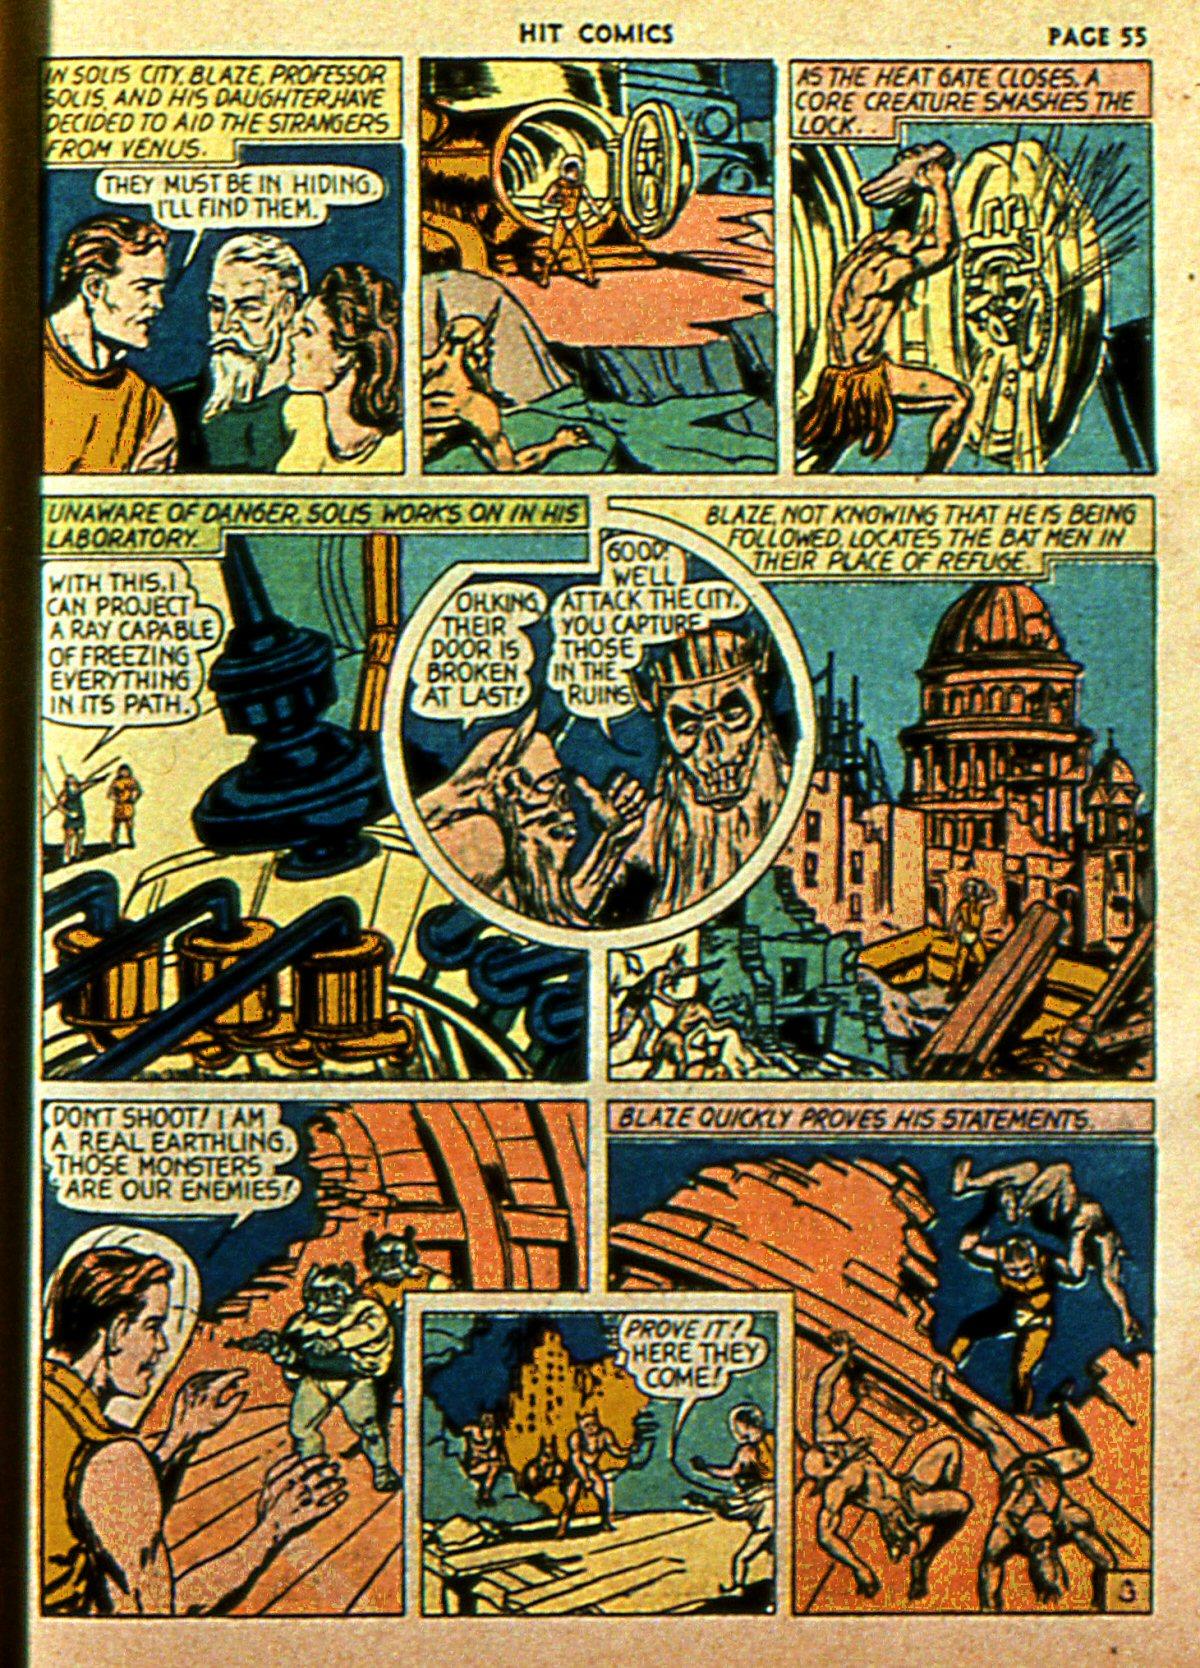 Read online Hit Comics comic -  Issue #2 - 57